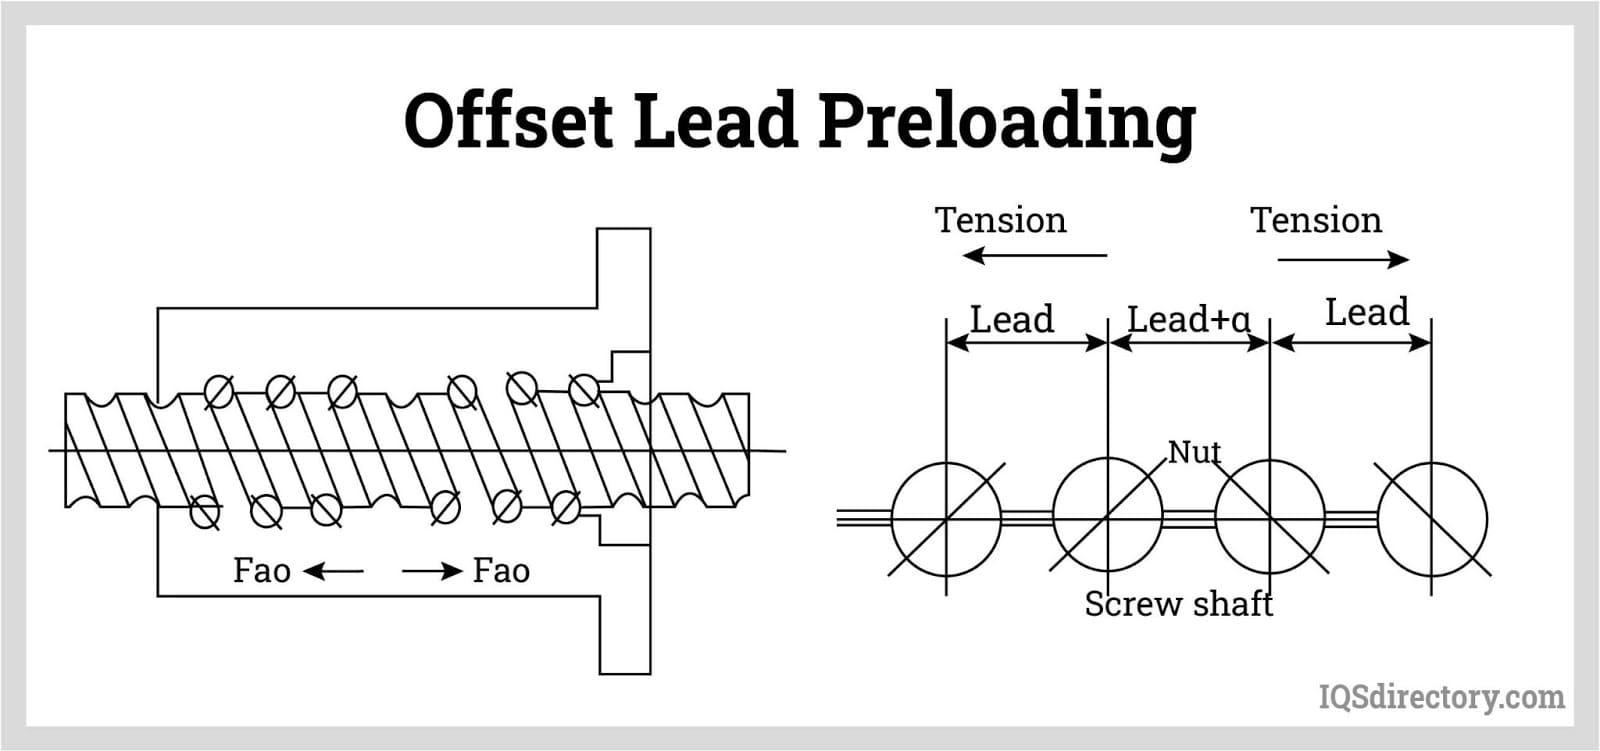 Offset Lead Preloading